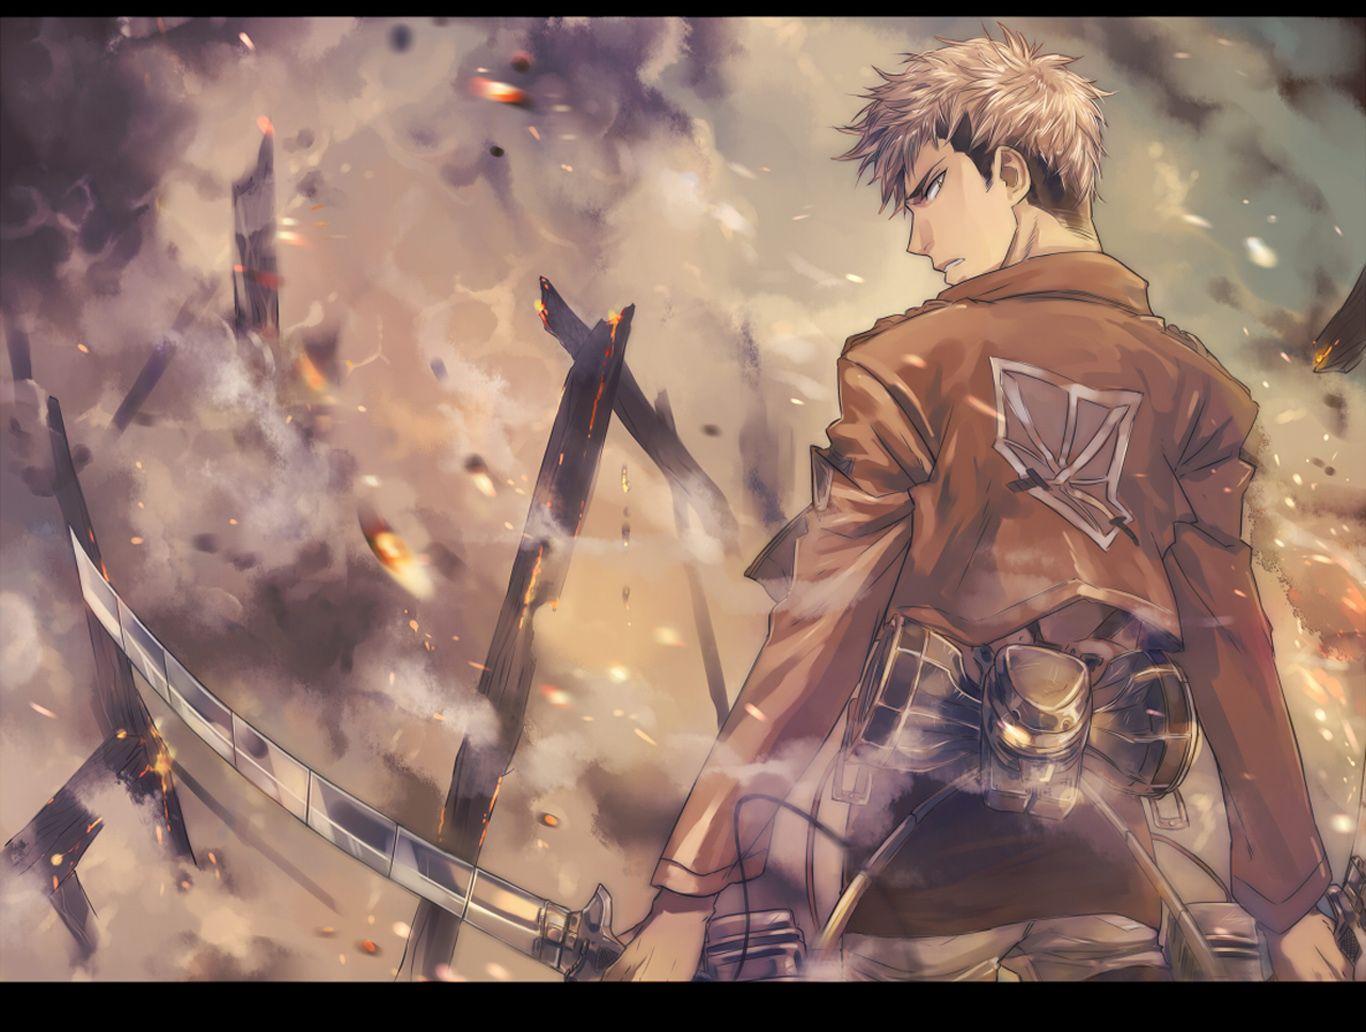 Manga Attack On Titan Wallpapers Top Free Manga Attack On Titan Backgrounds Wallpaperaccess